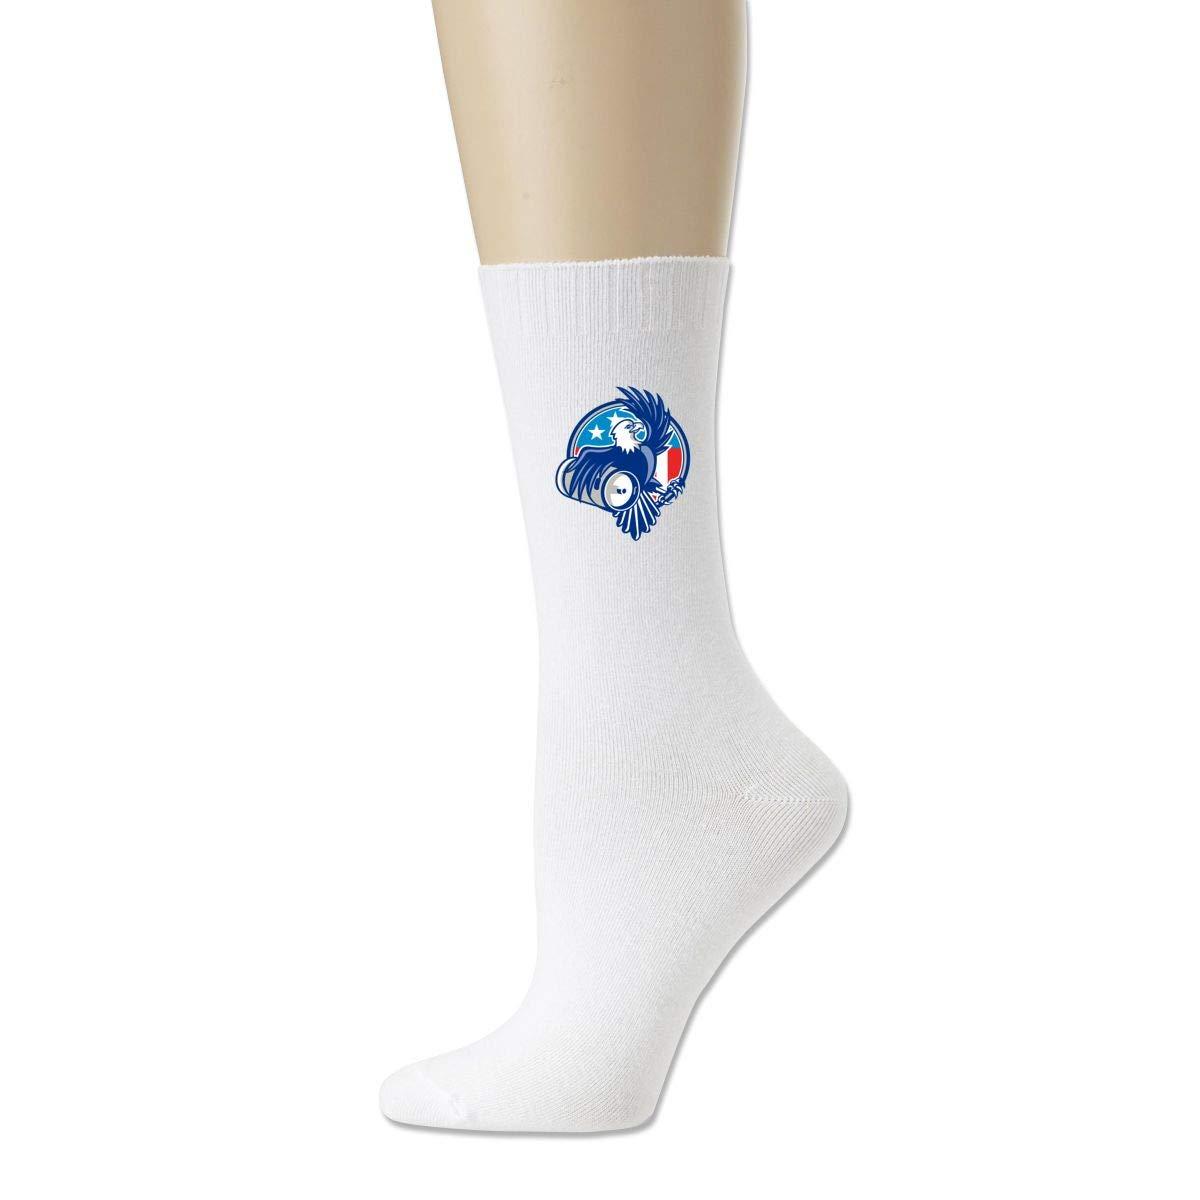 Rigg-socks American Bald Eagle Beer Keg Flag Circle Retro Mens Comfortable Sport Socks Gray